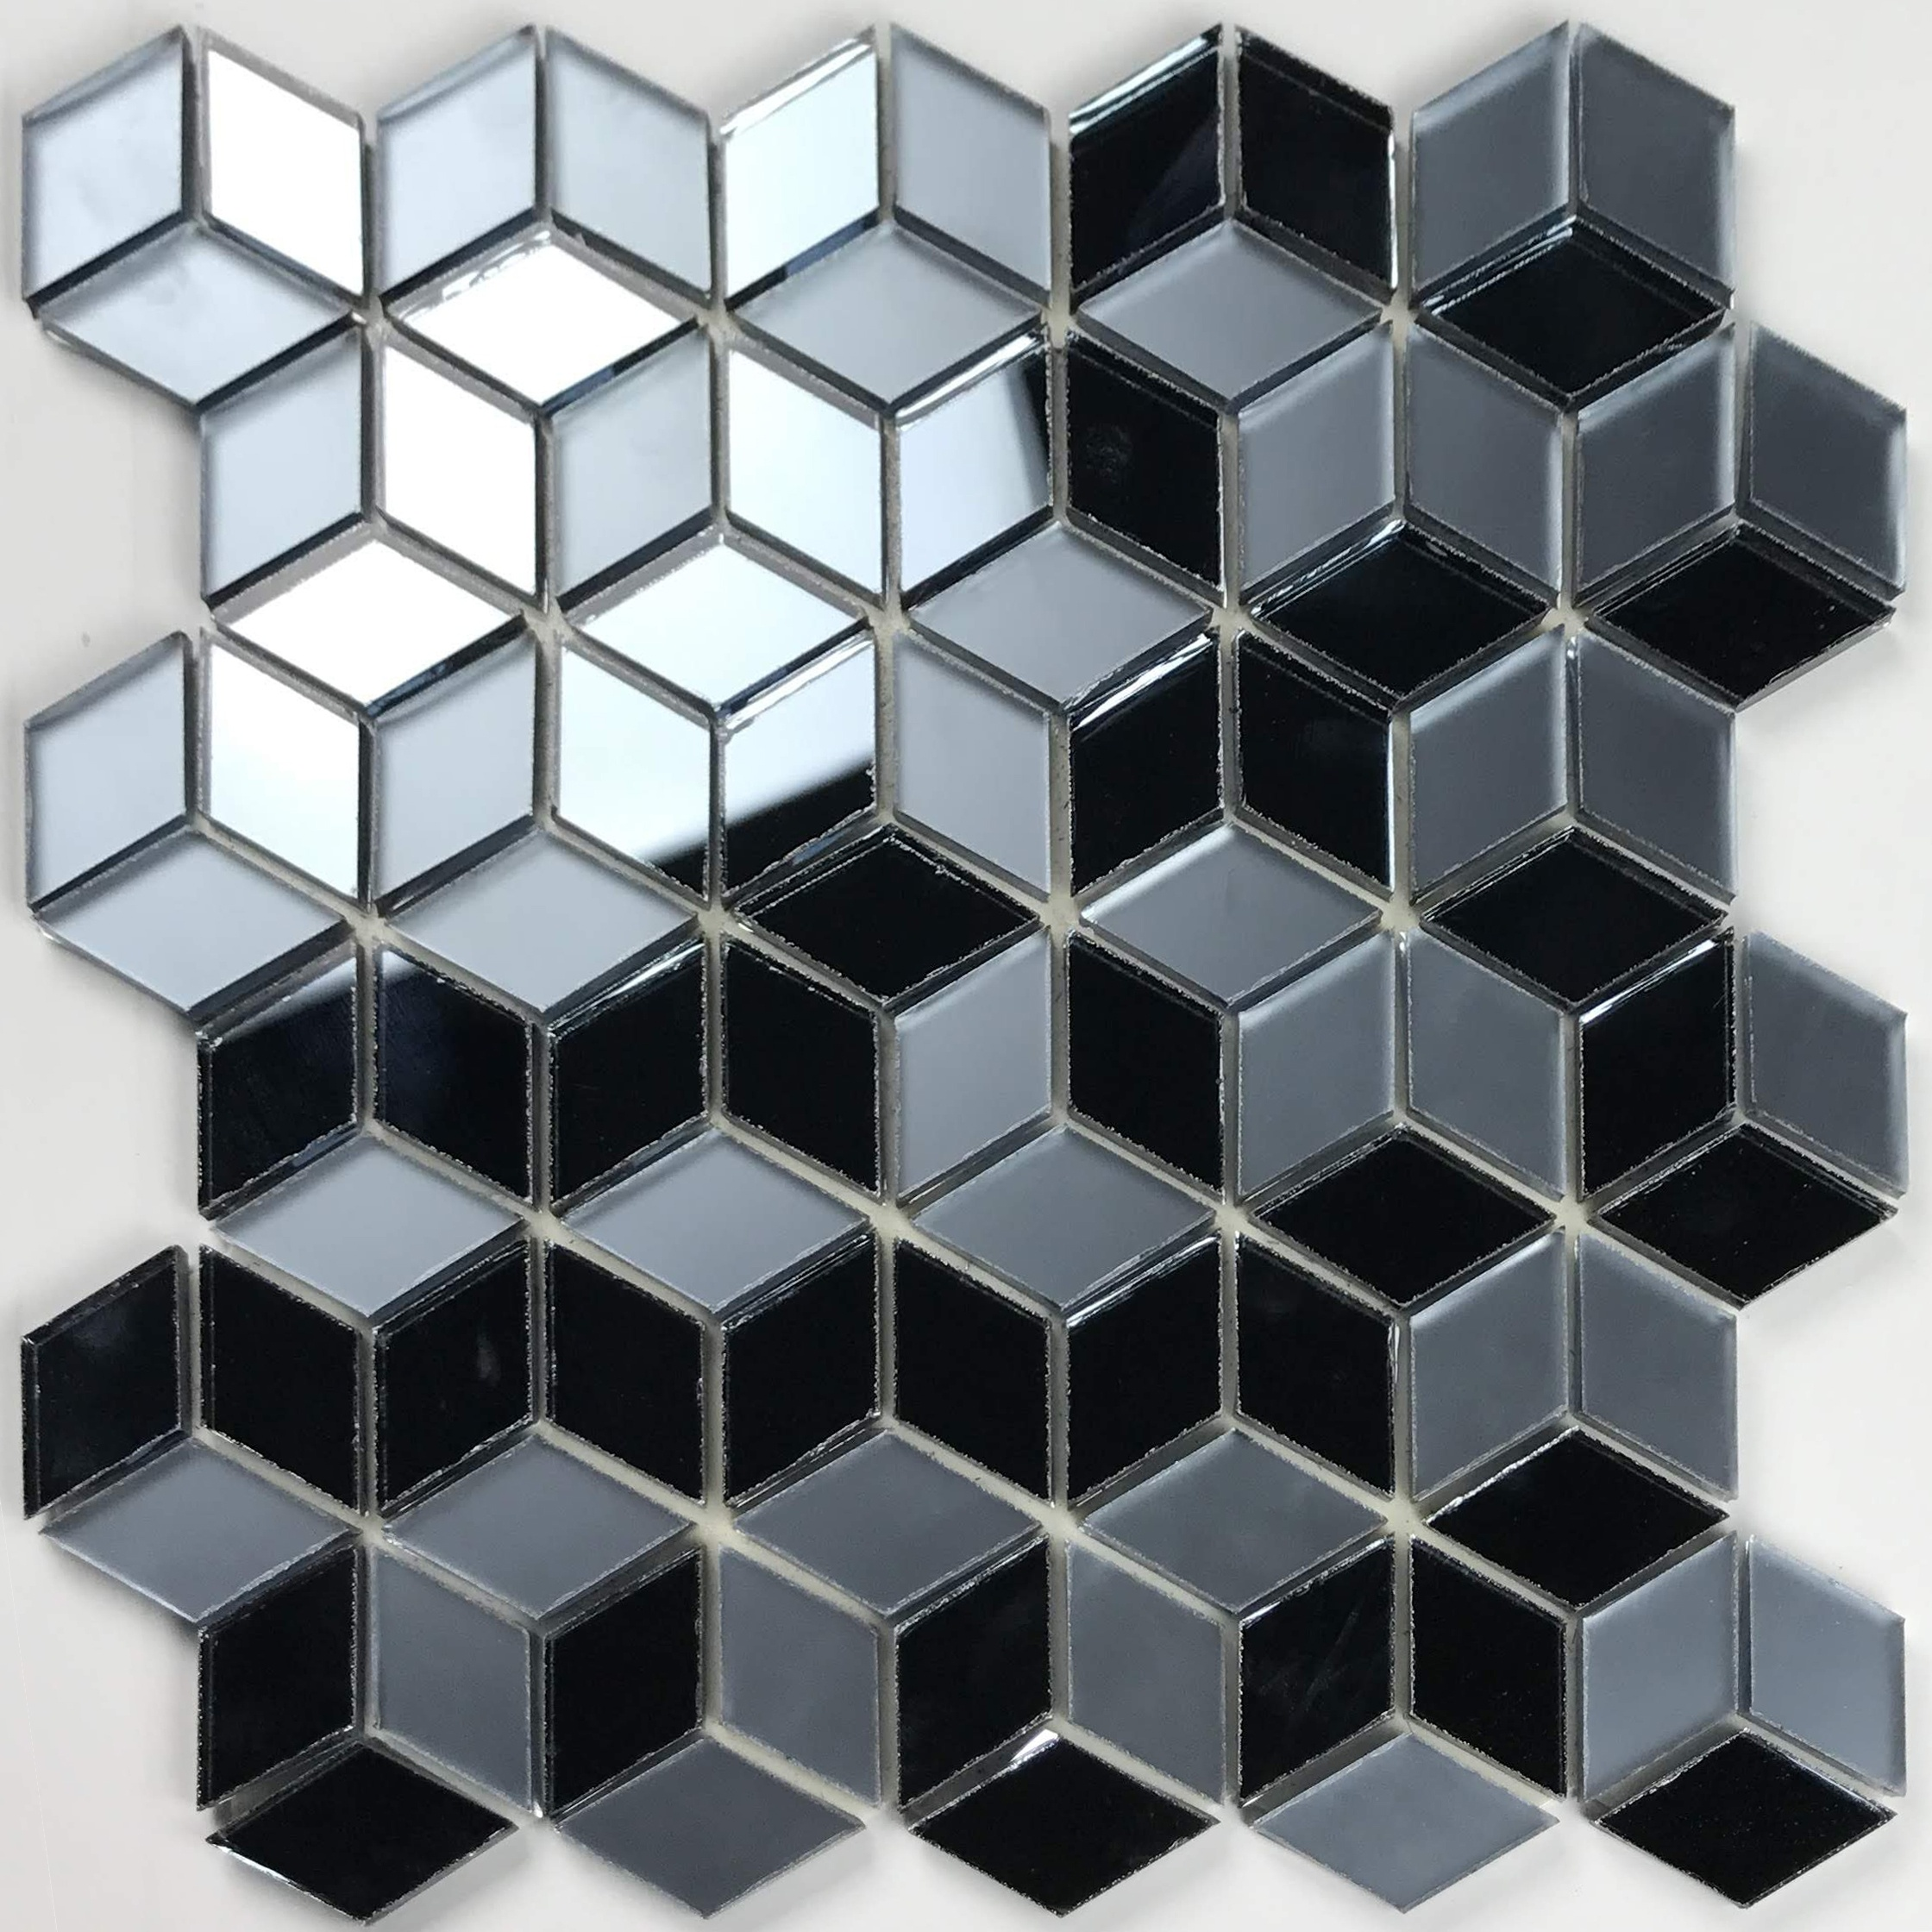 Musico 1 625 In X 1 875 In Glass Diamond Mosaic In